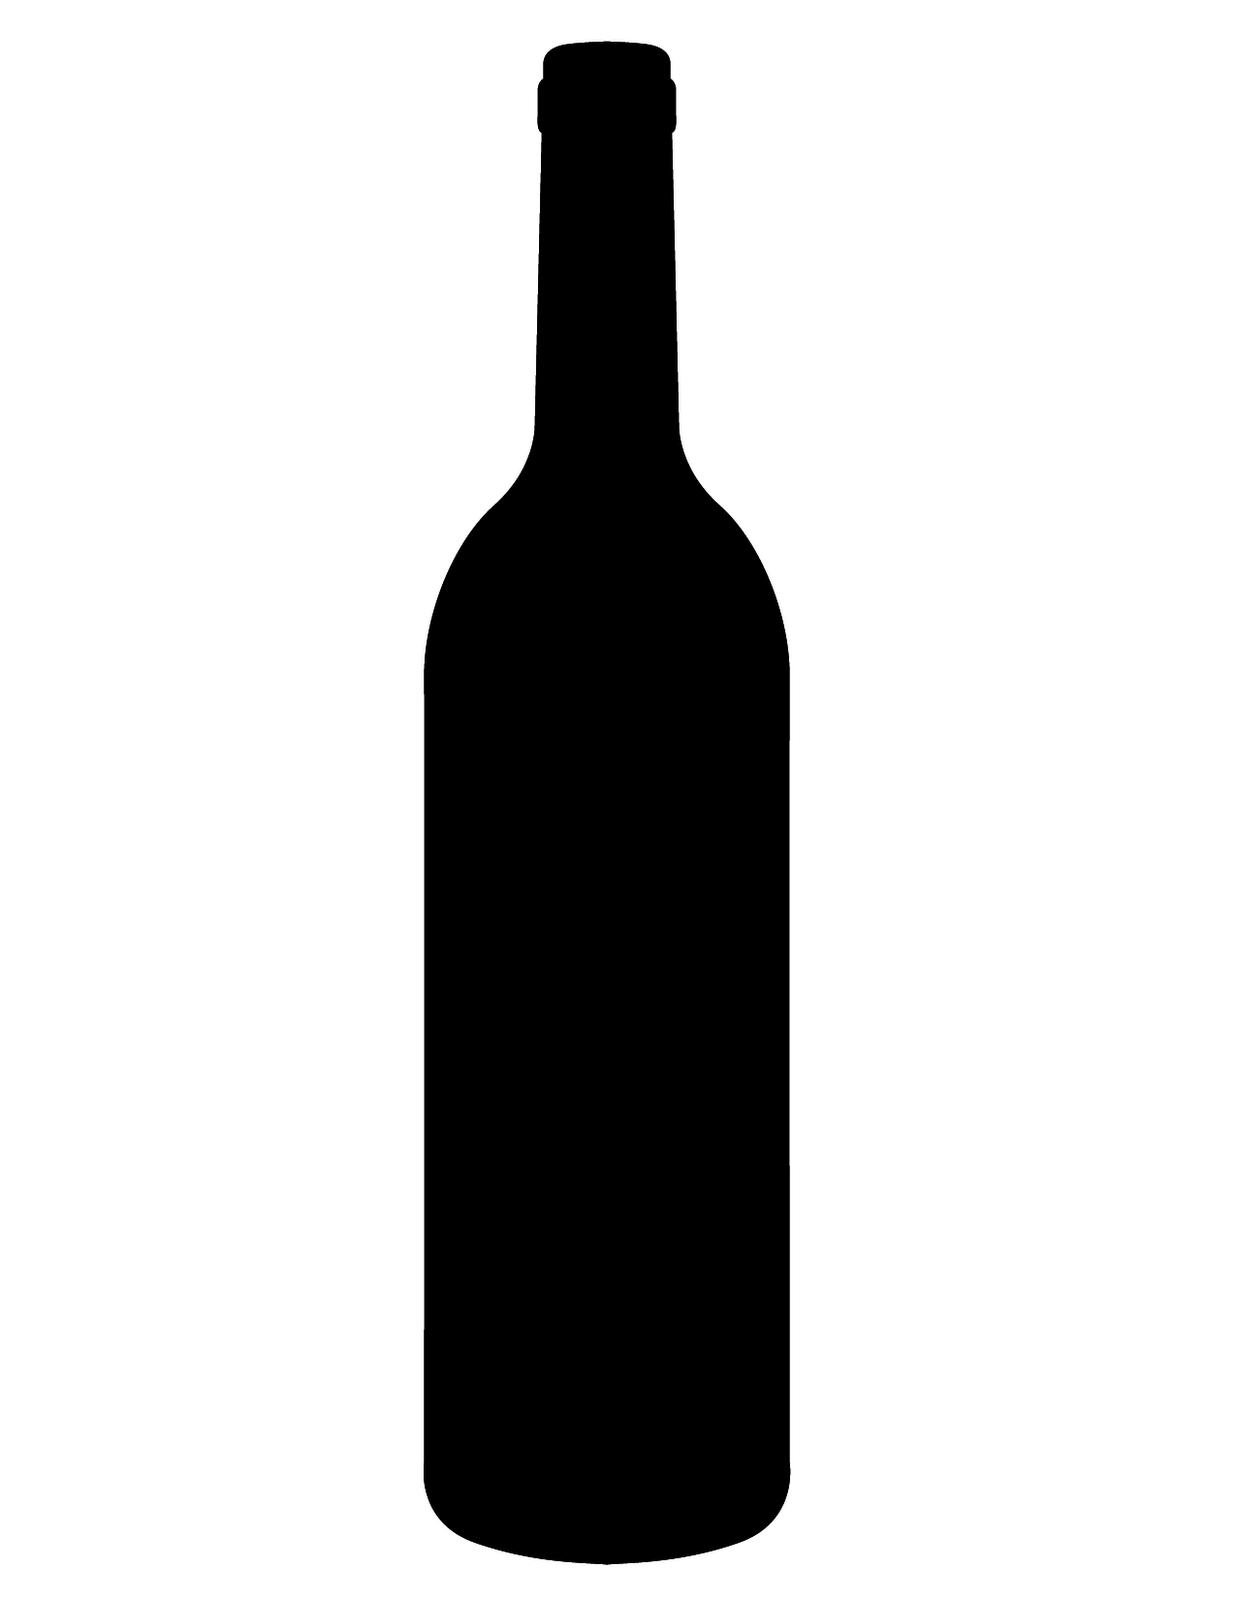 $80 Bottle (Vision Loss Alliance)